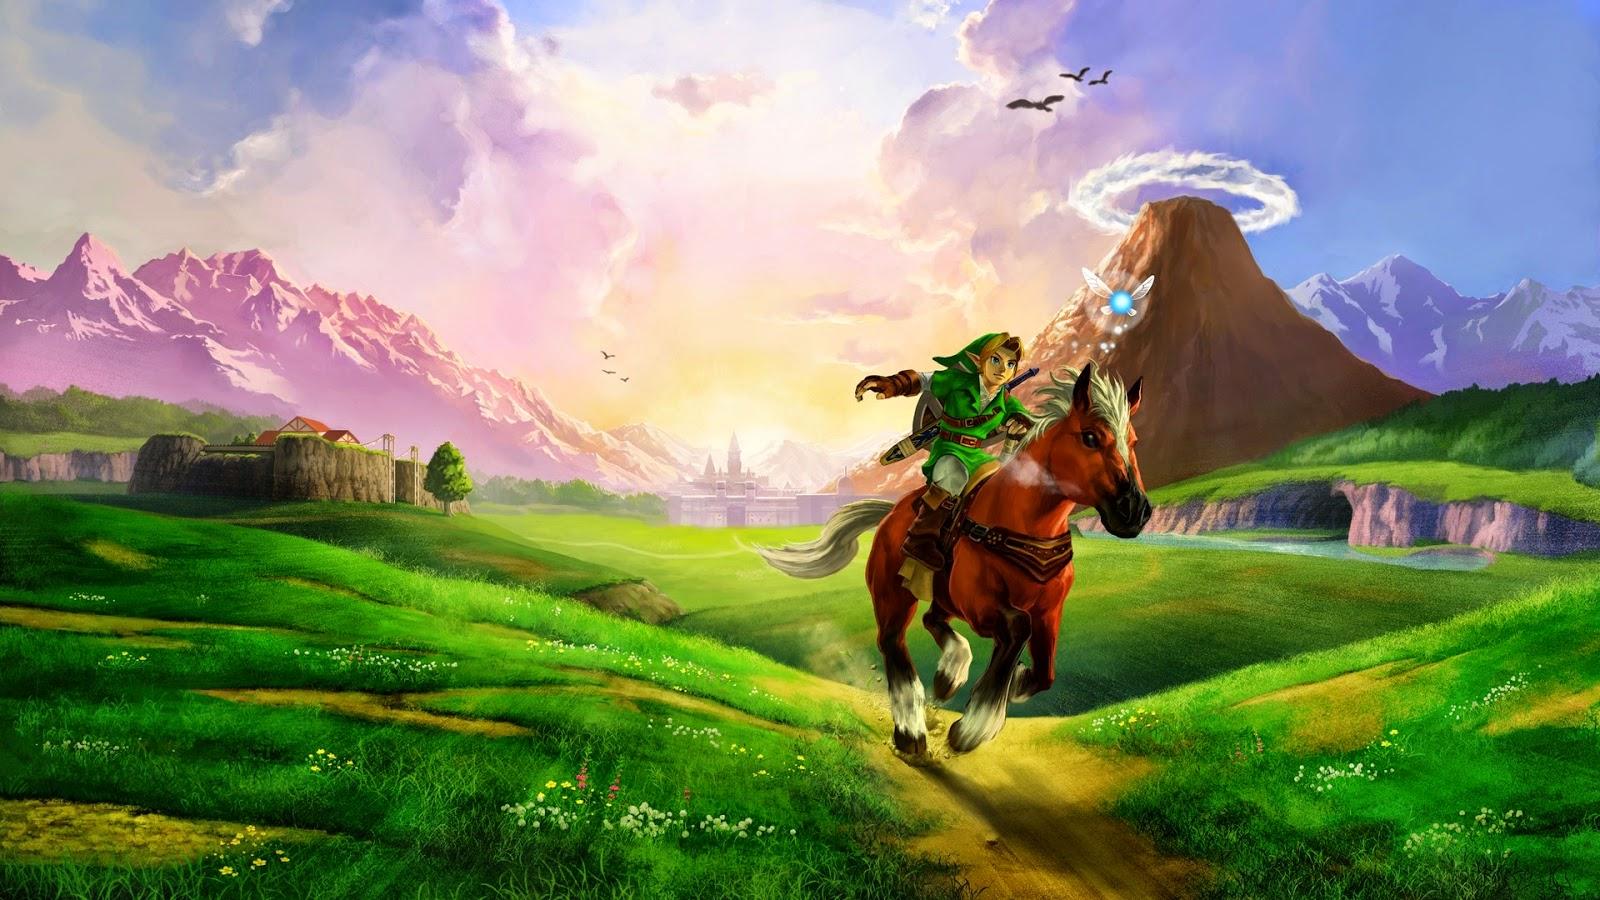 8-Bit Girl: Zelda Intros